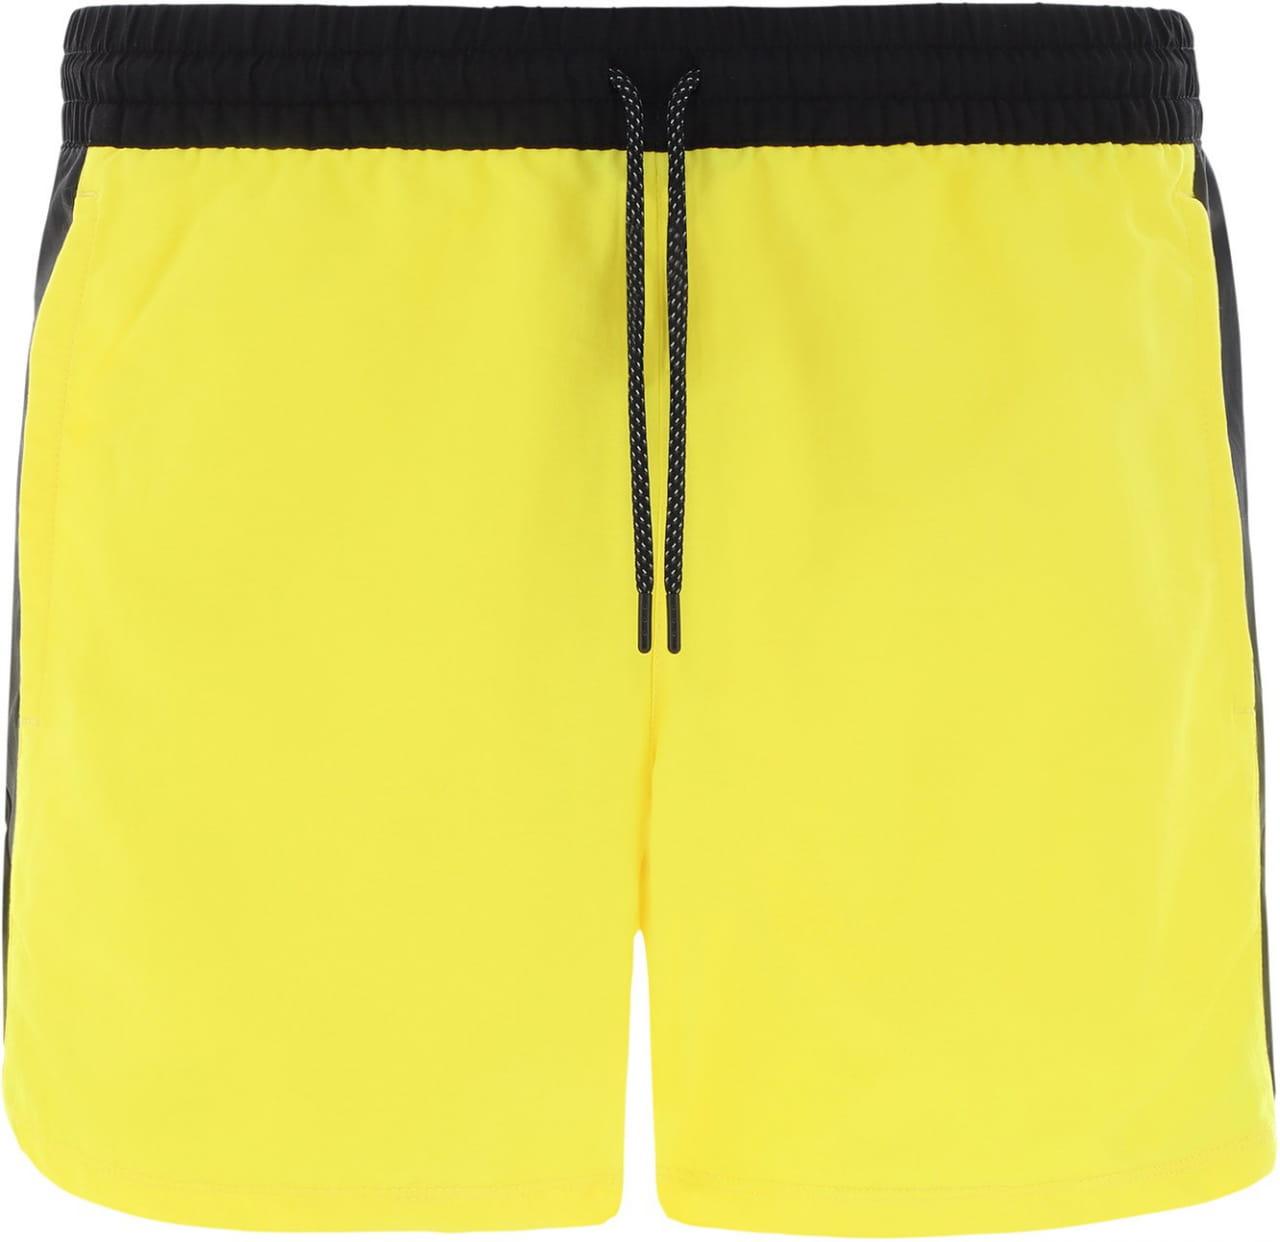 Pánské kraťasy The North Face Men's Extreme Shorts